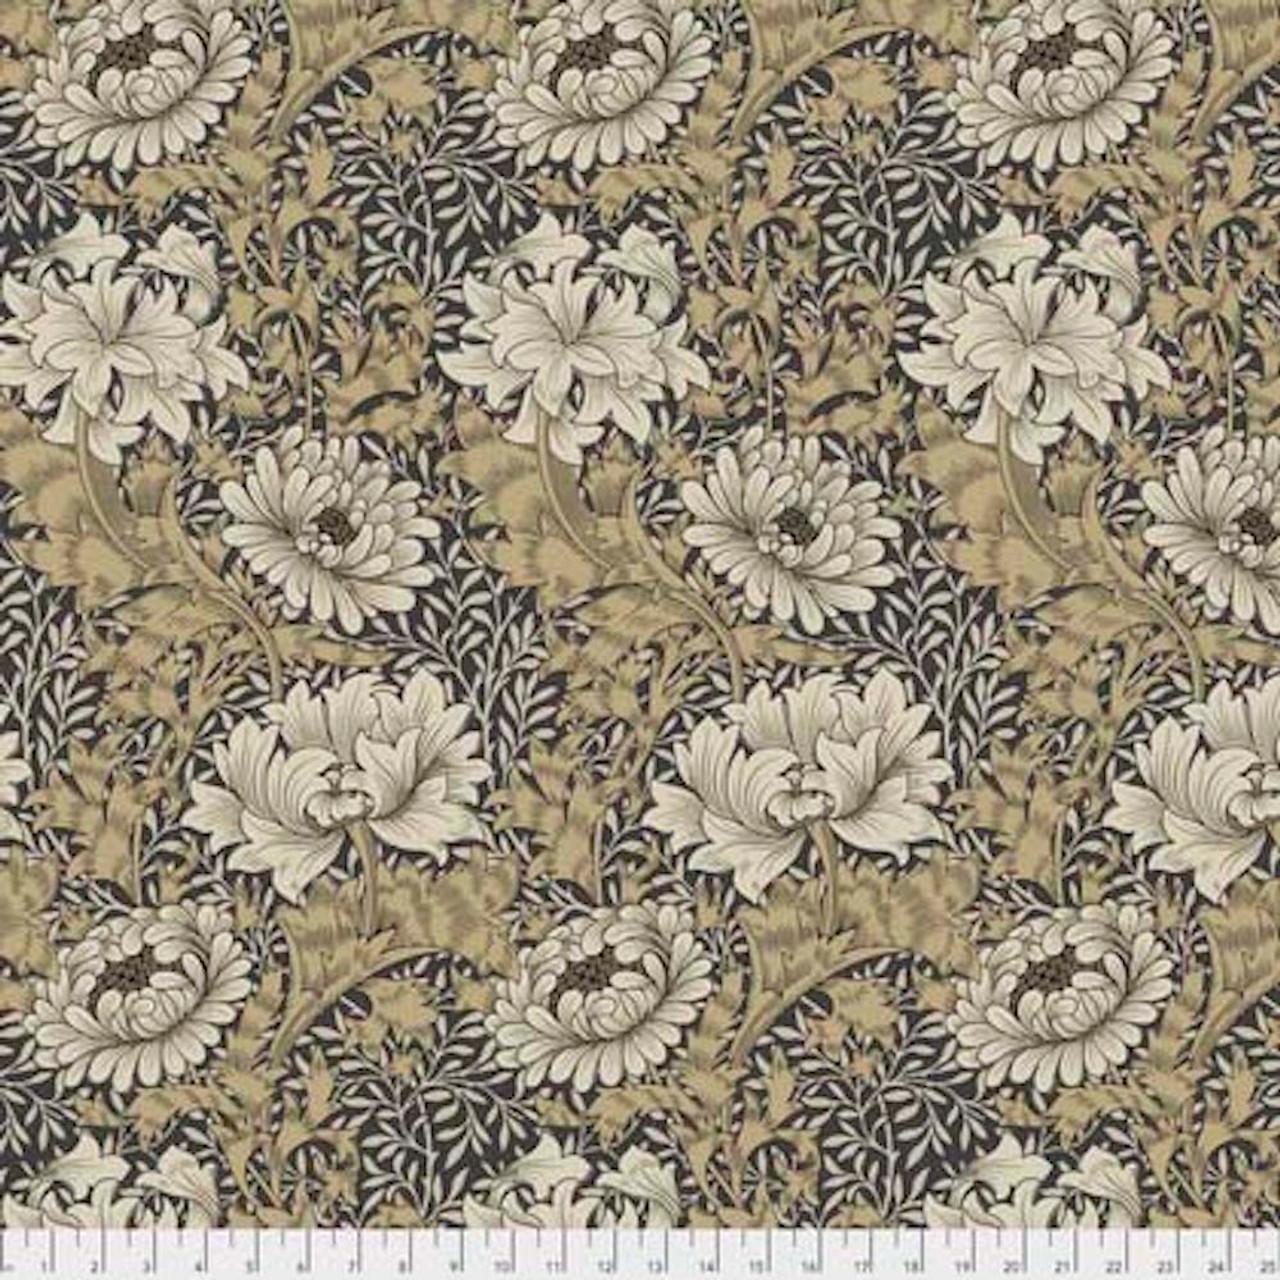 Morris & Co. Merton PWWM009 Chrysanthemum Taupe Cotton Fabric By Yd